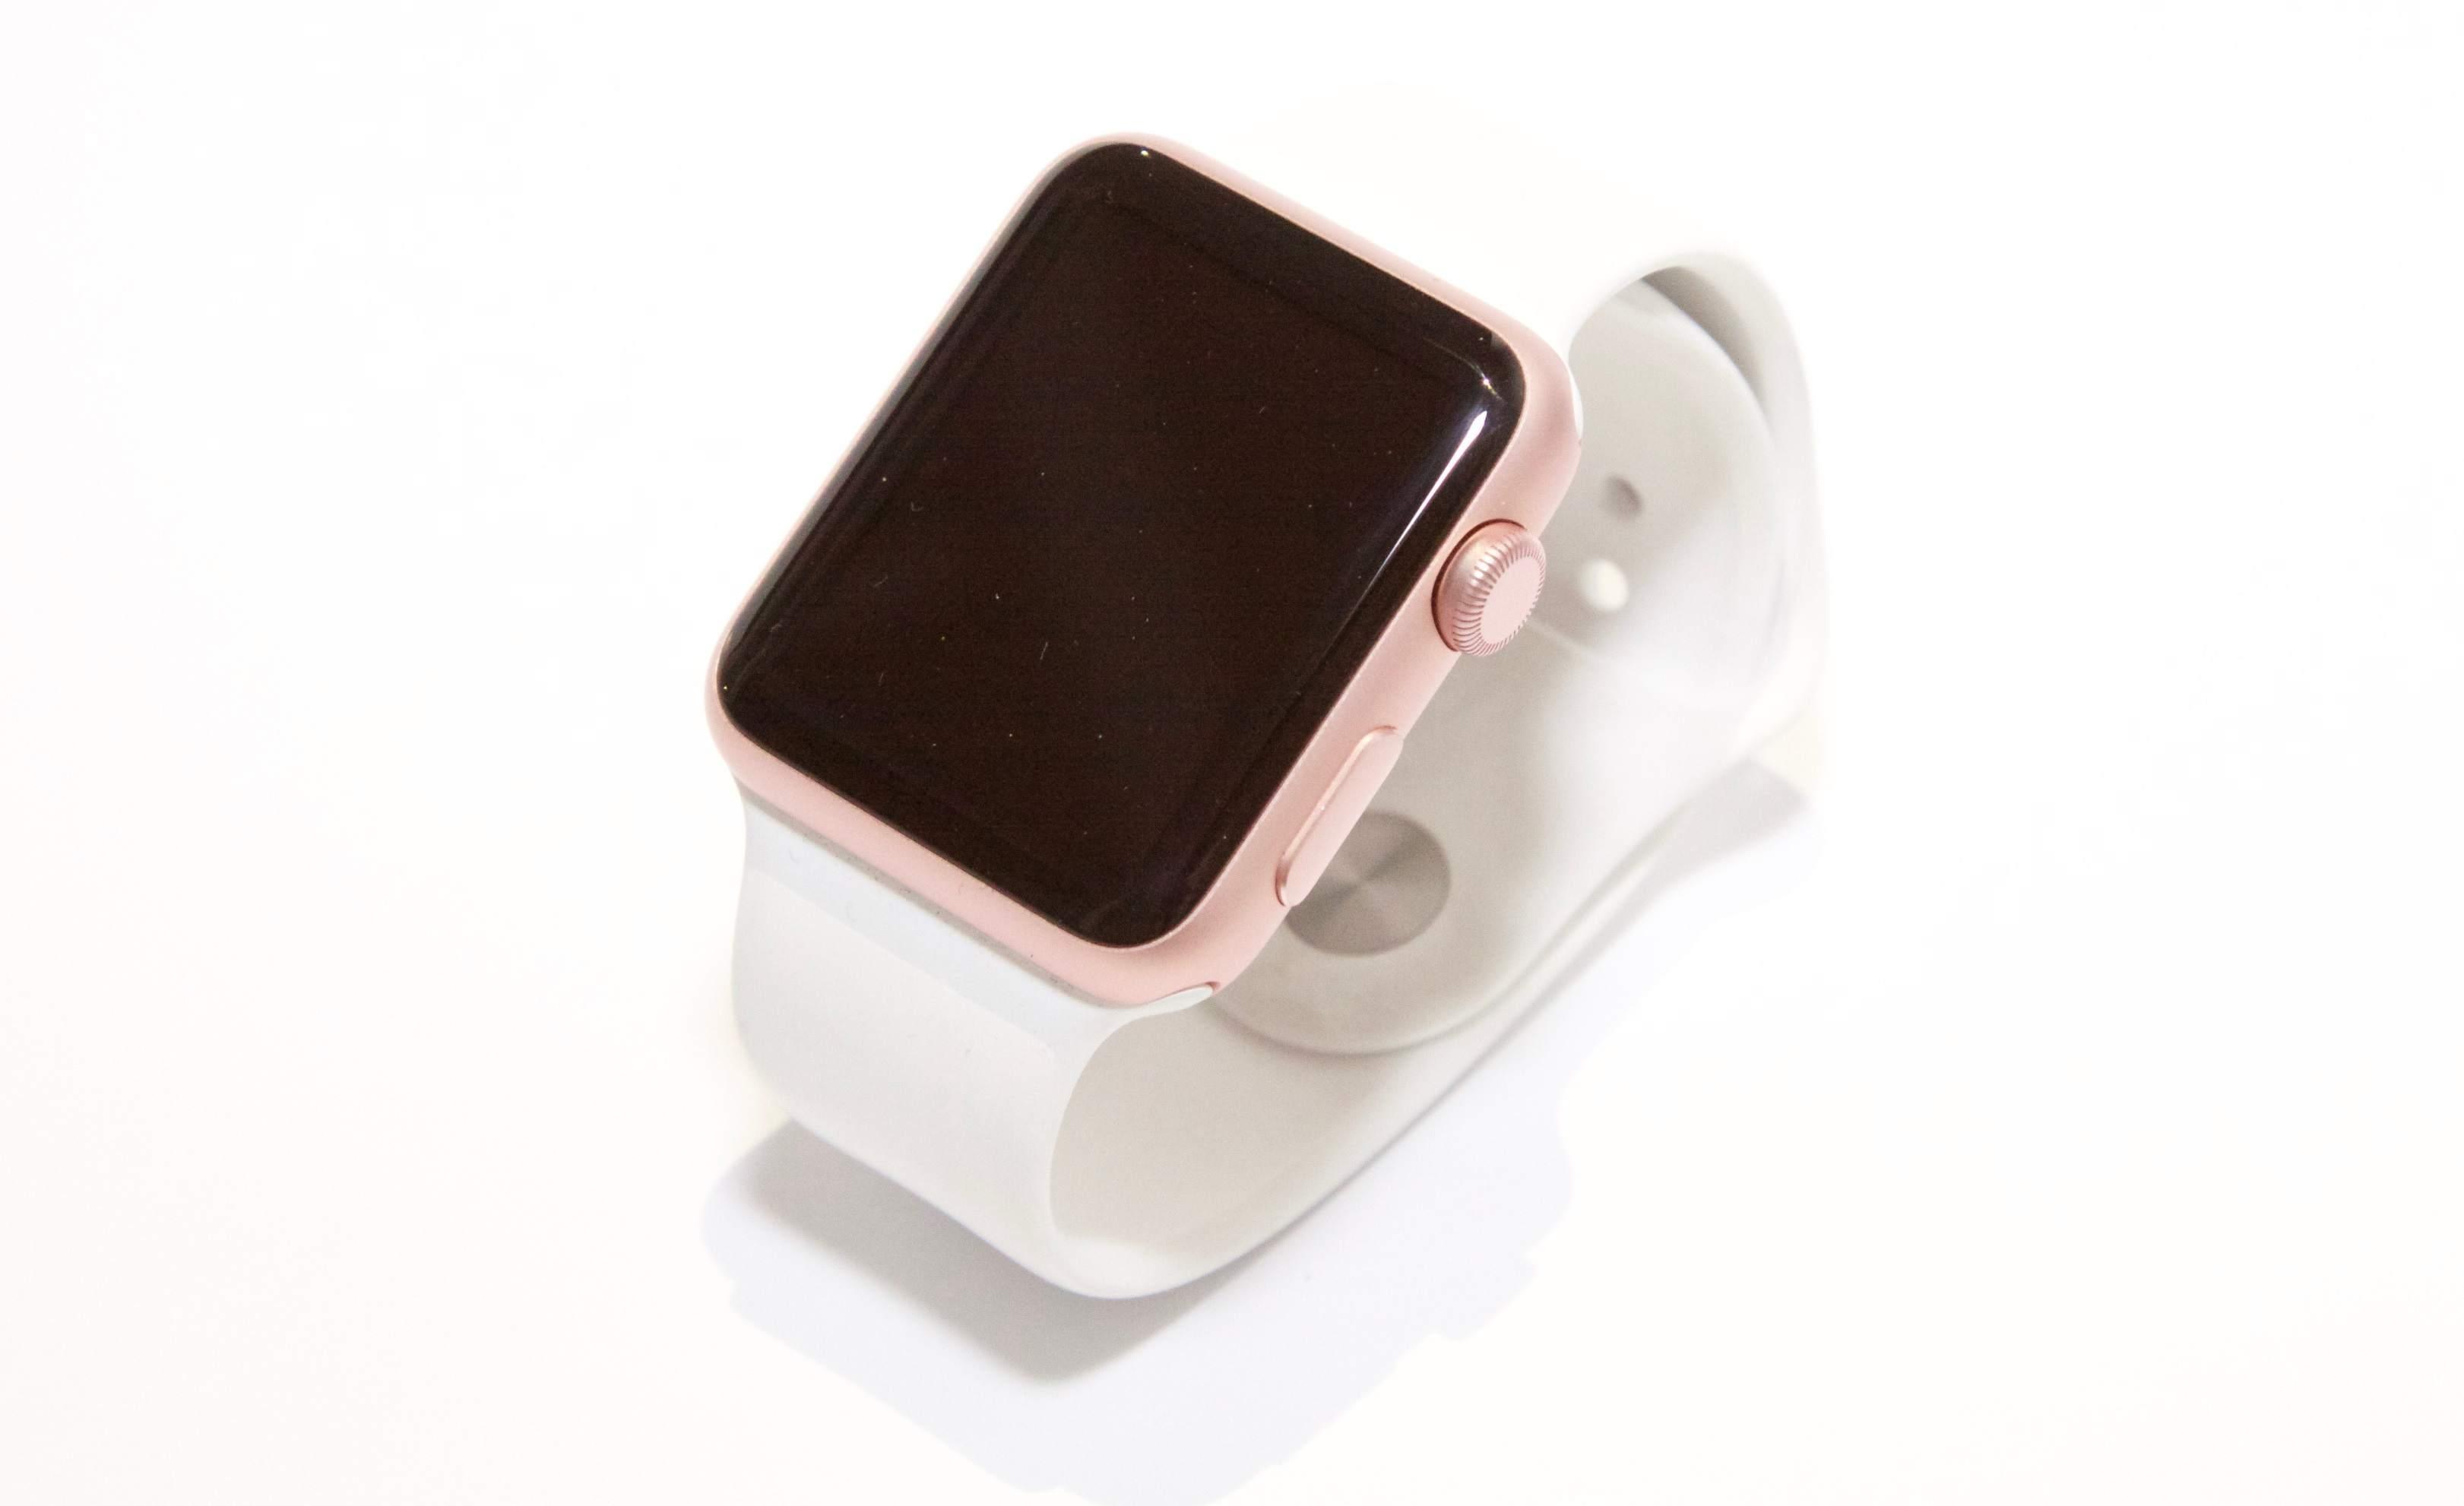 Fix an Apple Watch That Won't Turn On